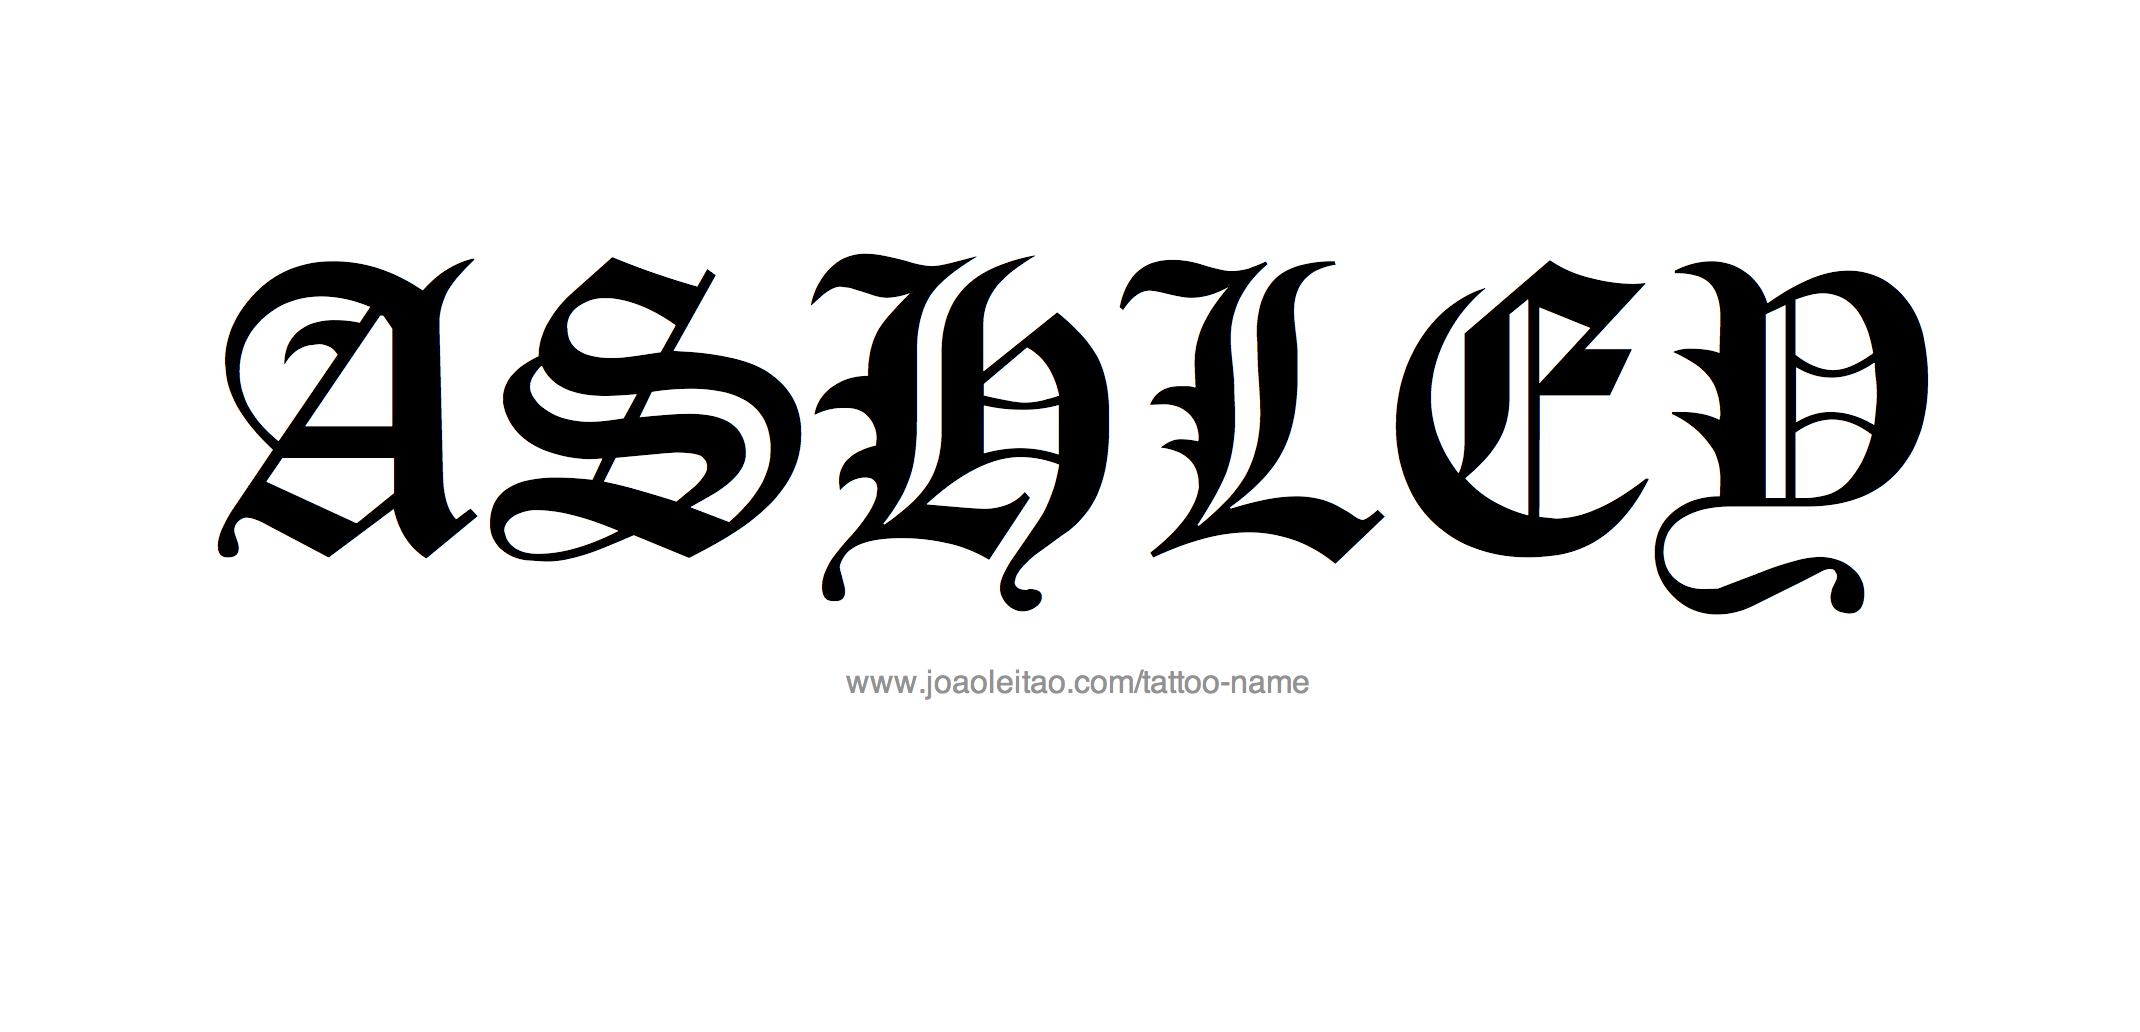 ashley name design